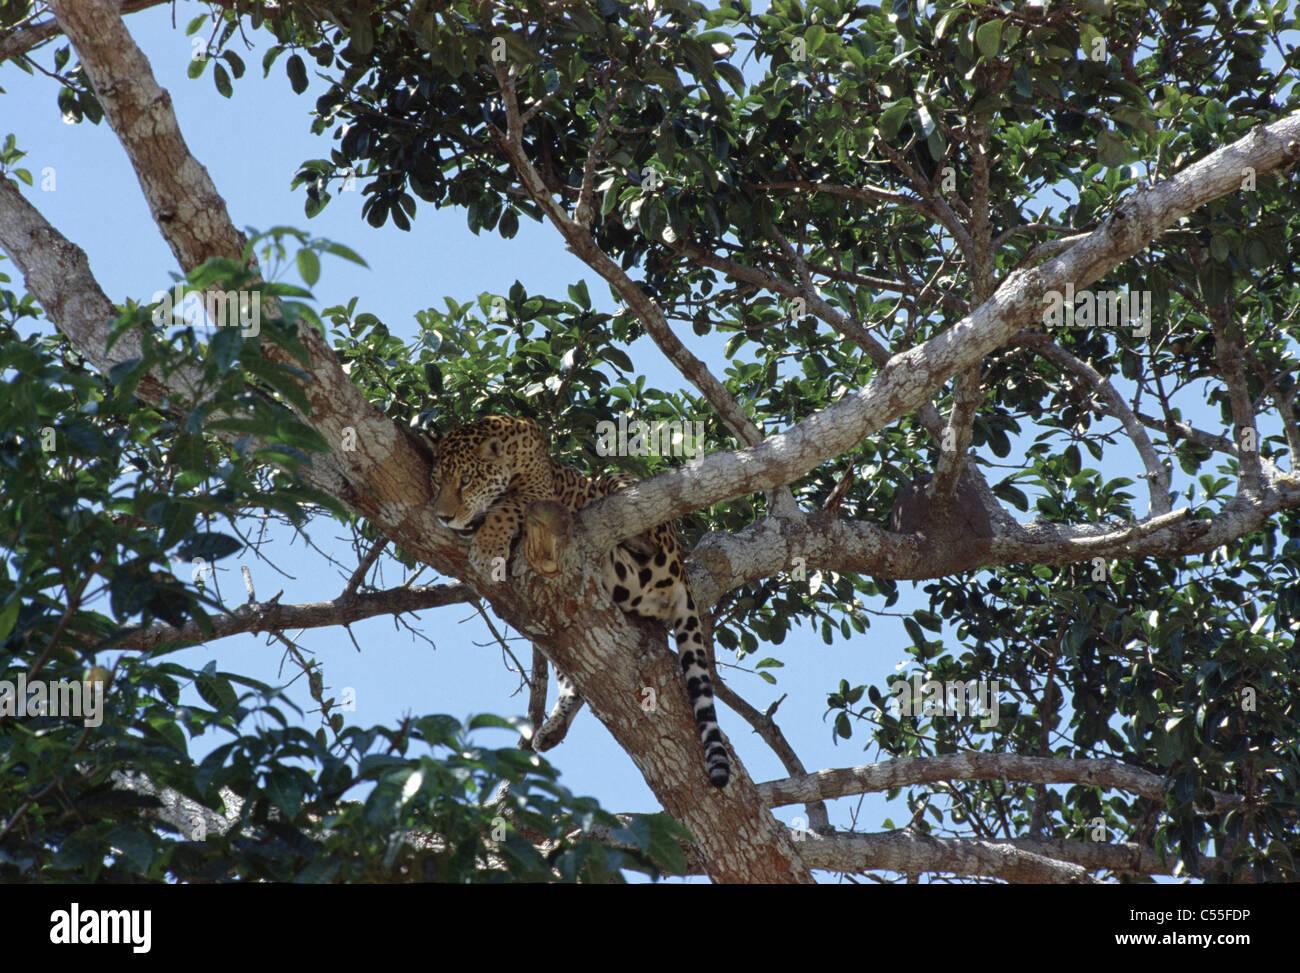 Jaguar Amazon Region Brazil - Stock Image